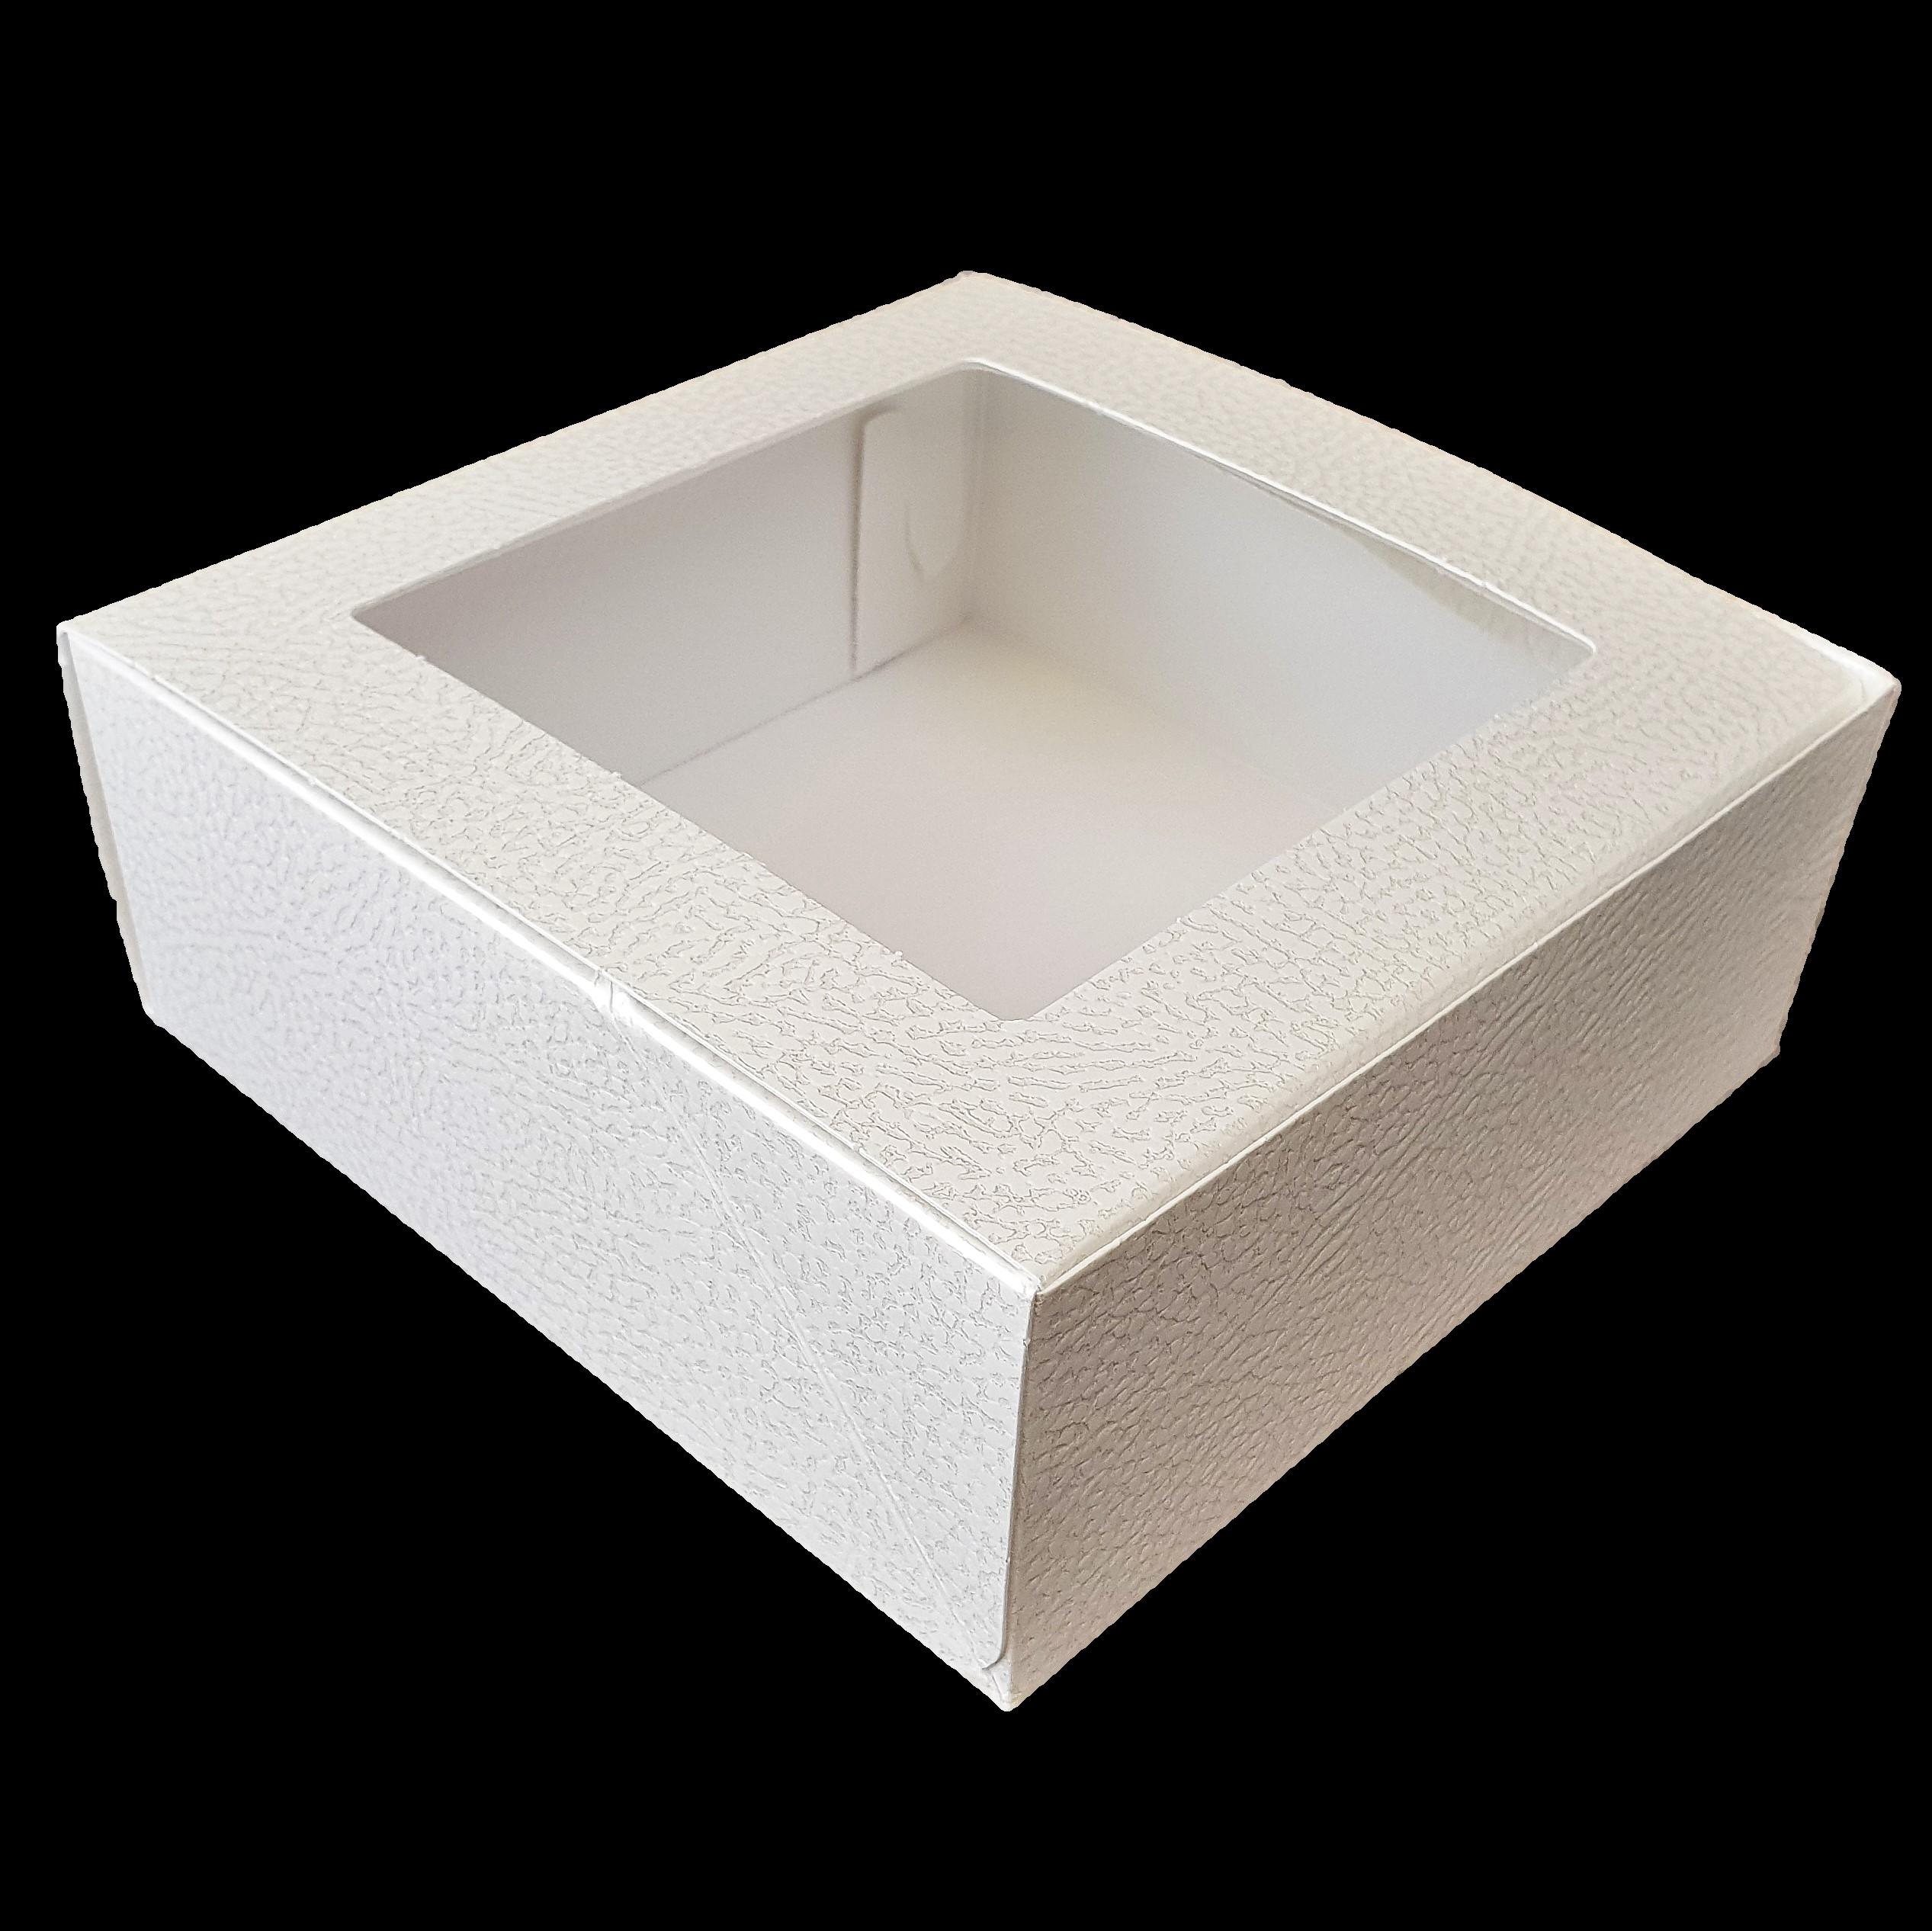 Cake box.